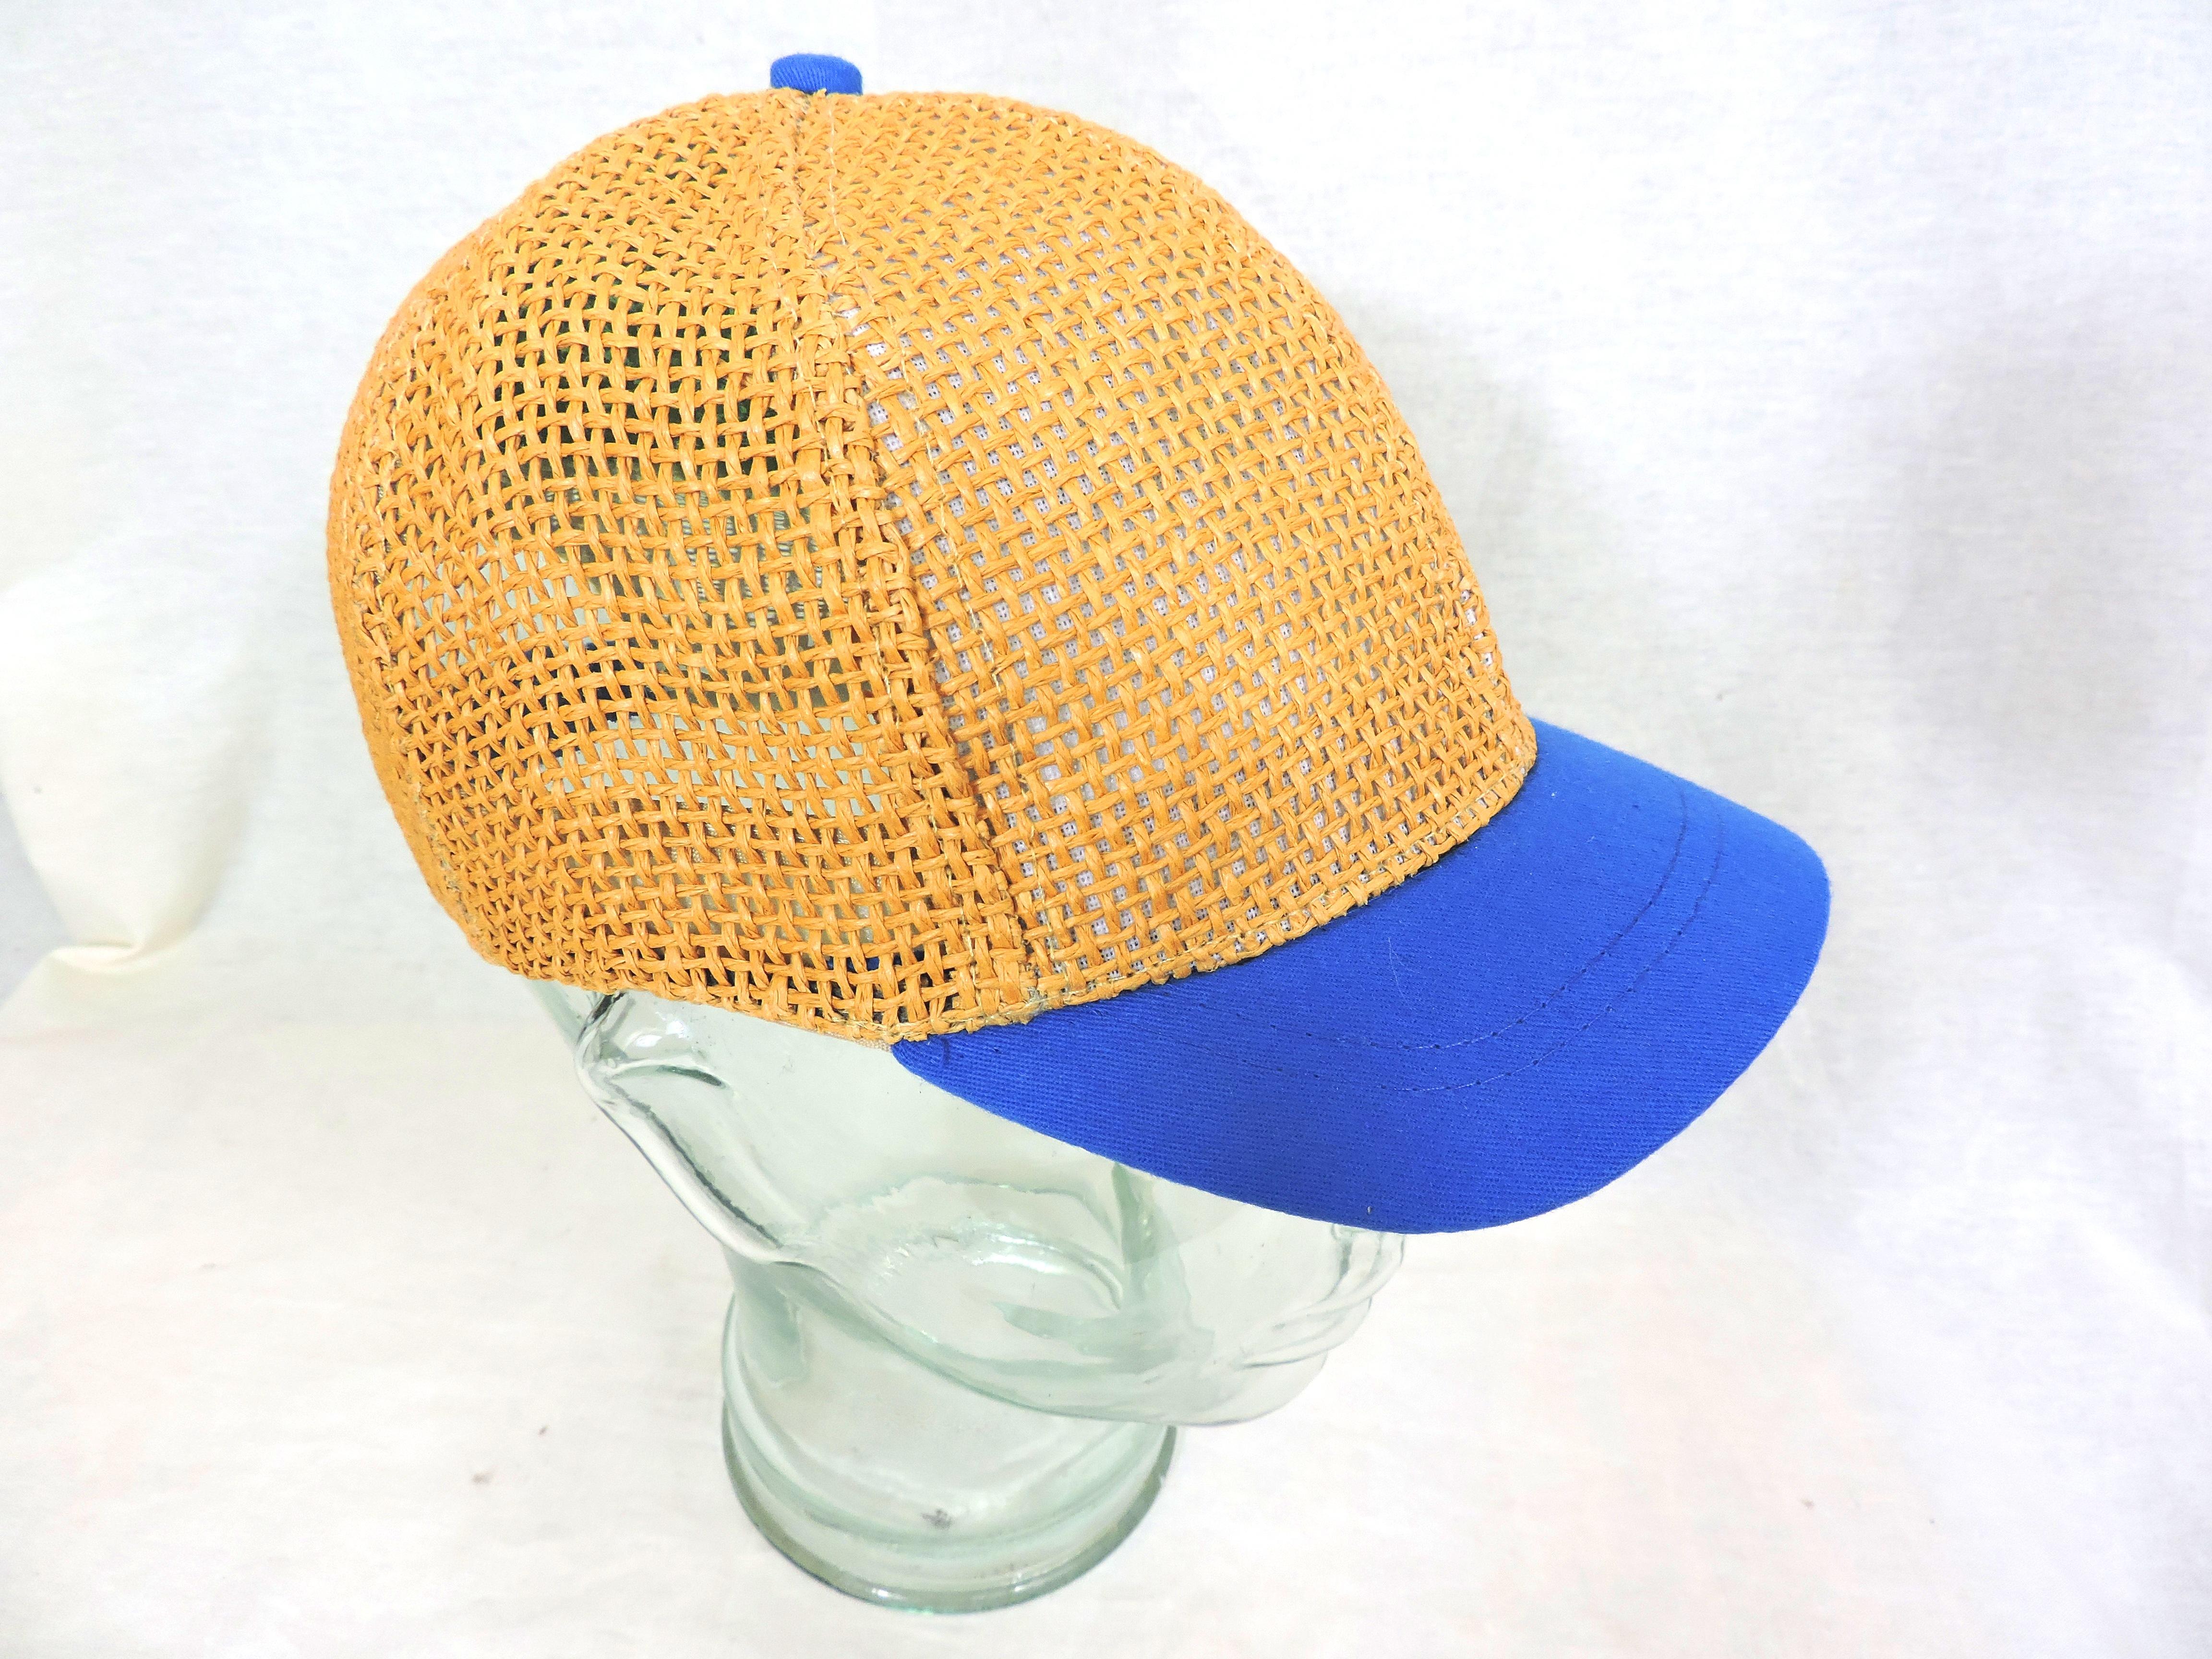 Open Straw ball cap small - Reshats 9f76dc5dd6a